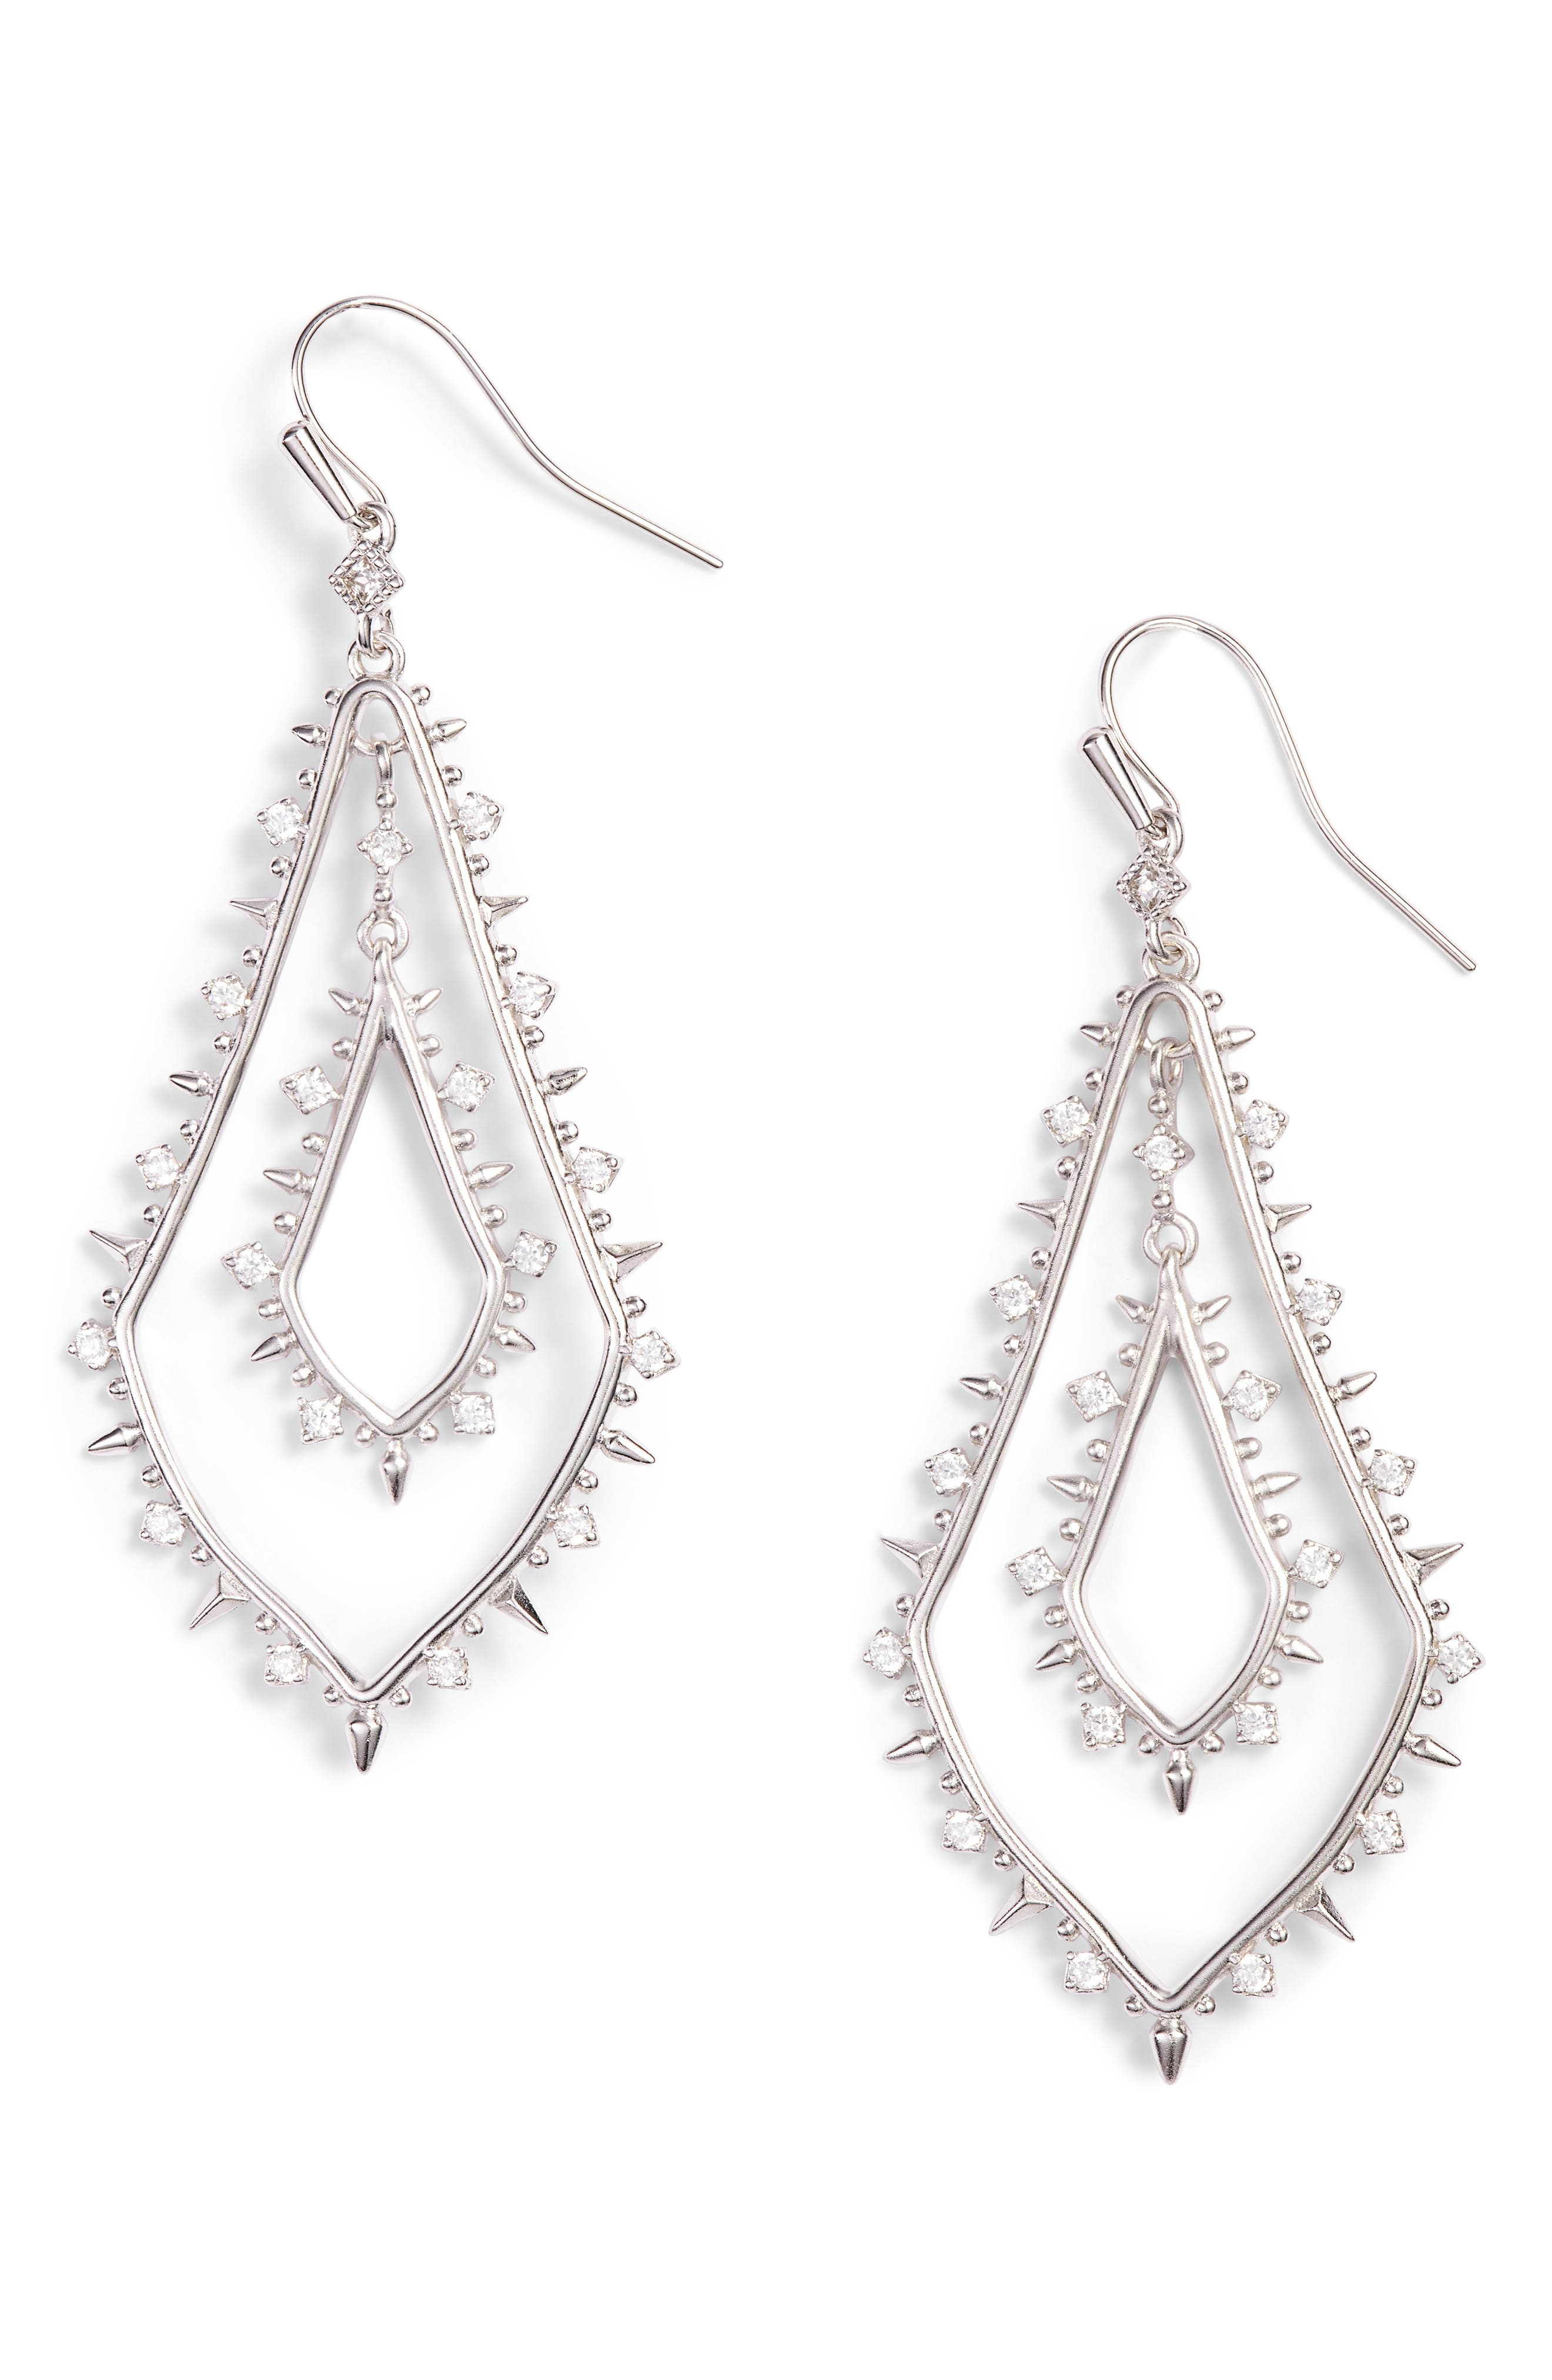 Alice Drop Earrings,                             Main thumbnail 1, color,                             White/ Silver